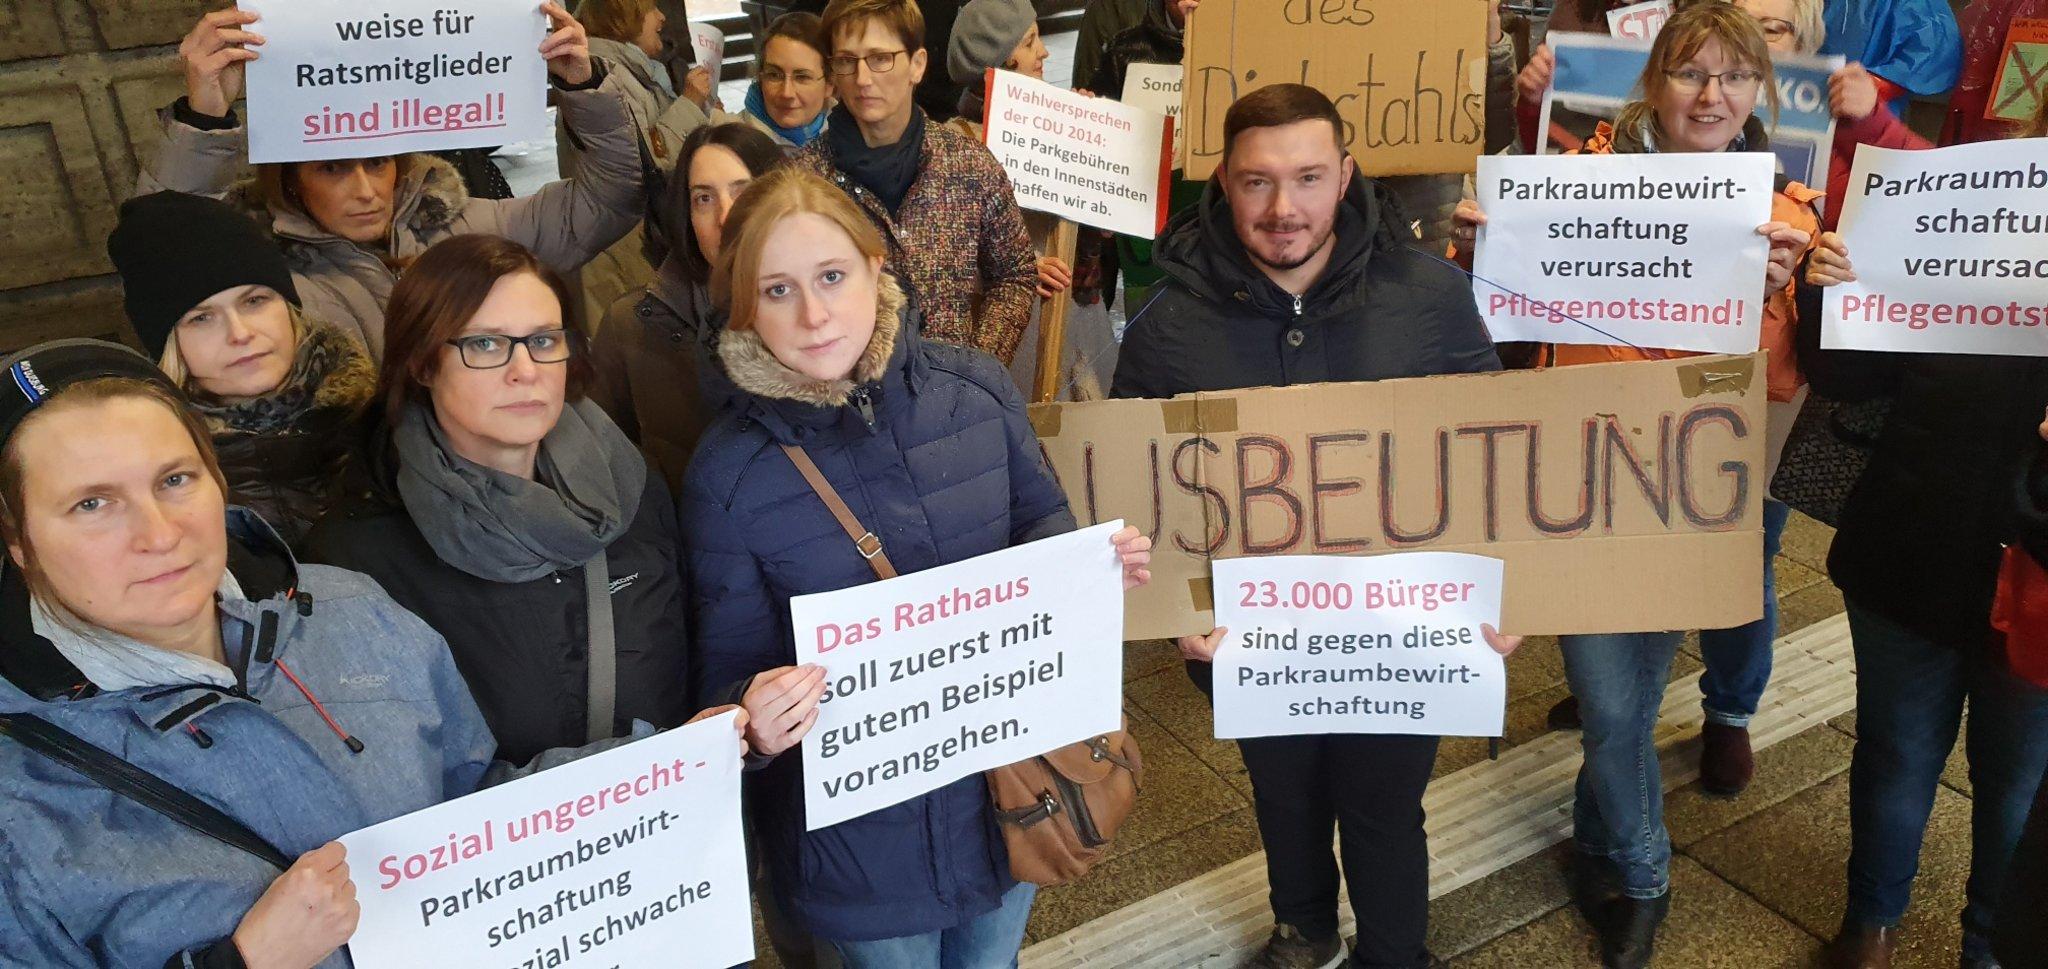 Rat entscheidet positiv über Parkraumbewirtschaftung in Oberhausen: Protest gescheitert - Oberhausen - Lokalkompass.de